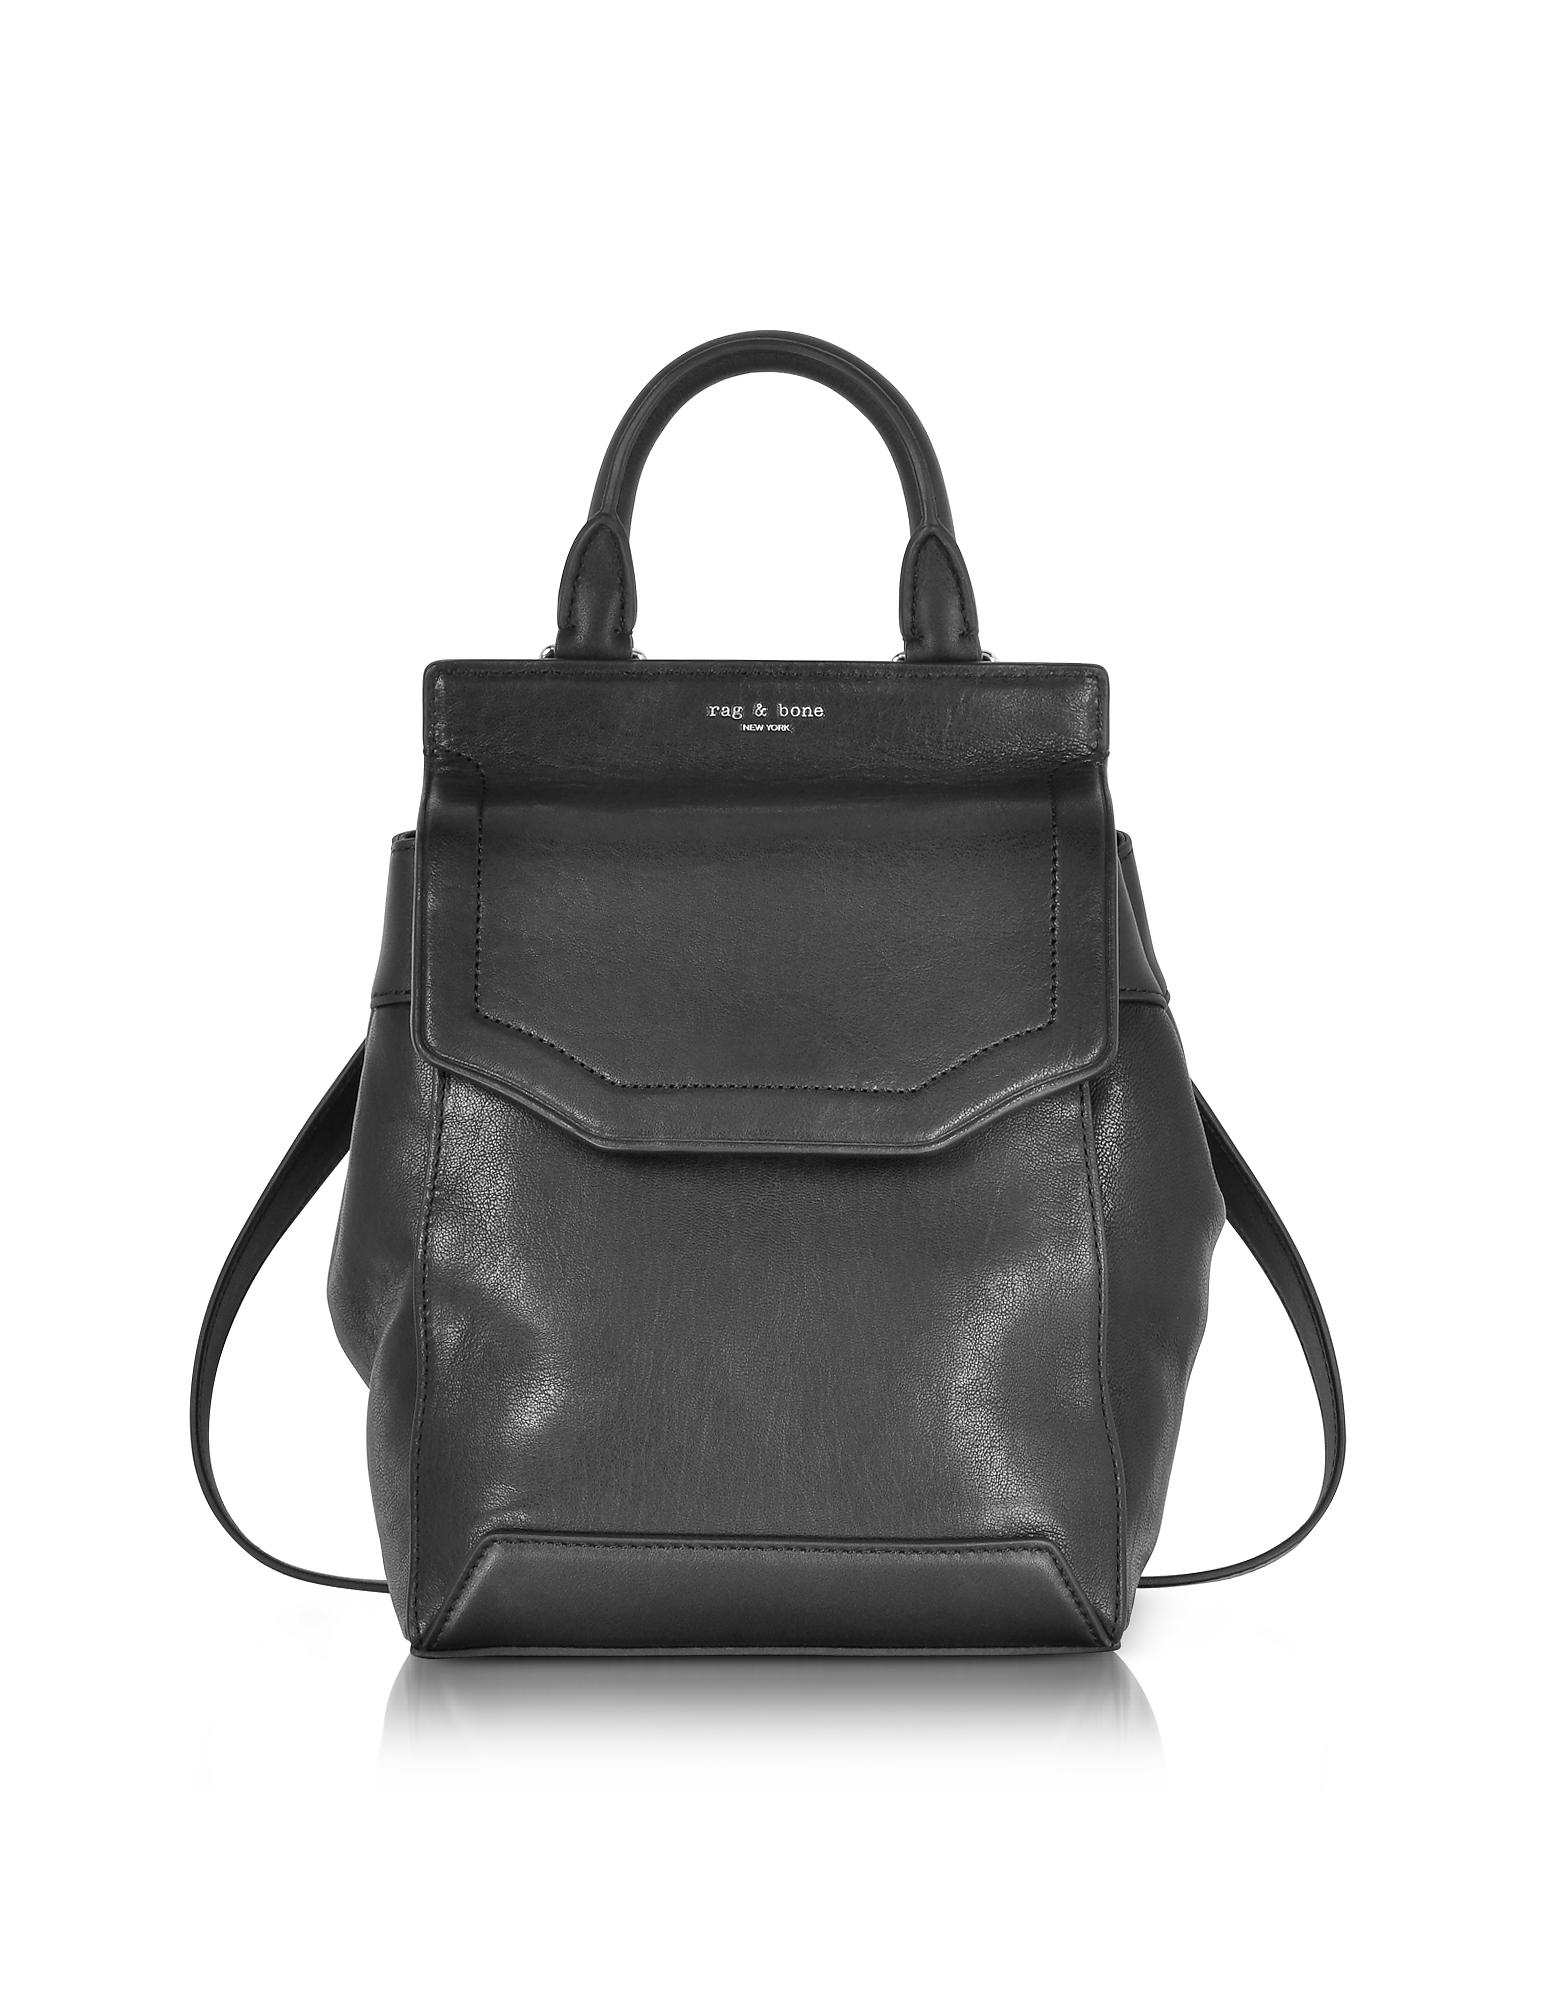 Image of Rag & Bone Designer Handbags, Black Leather Small Pilot Backpack II